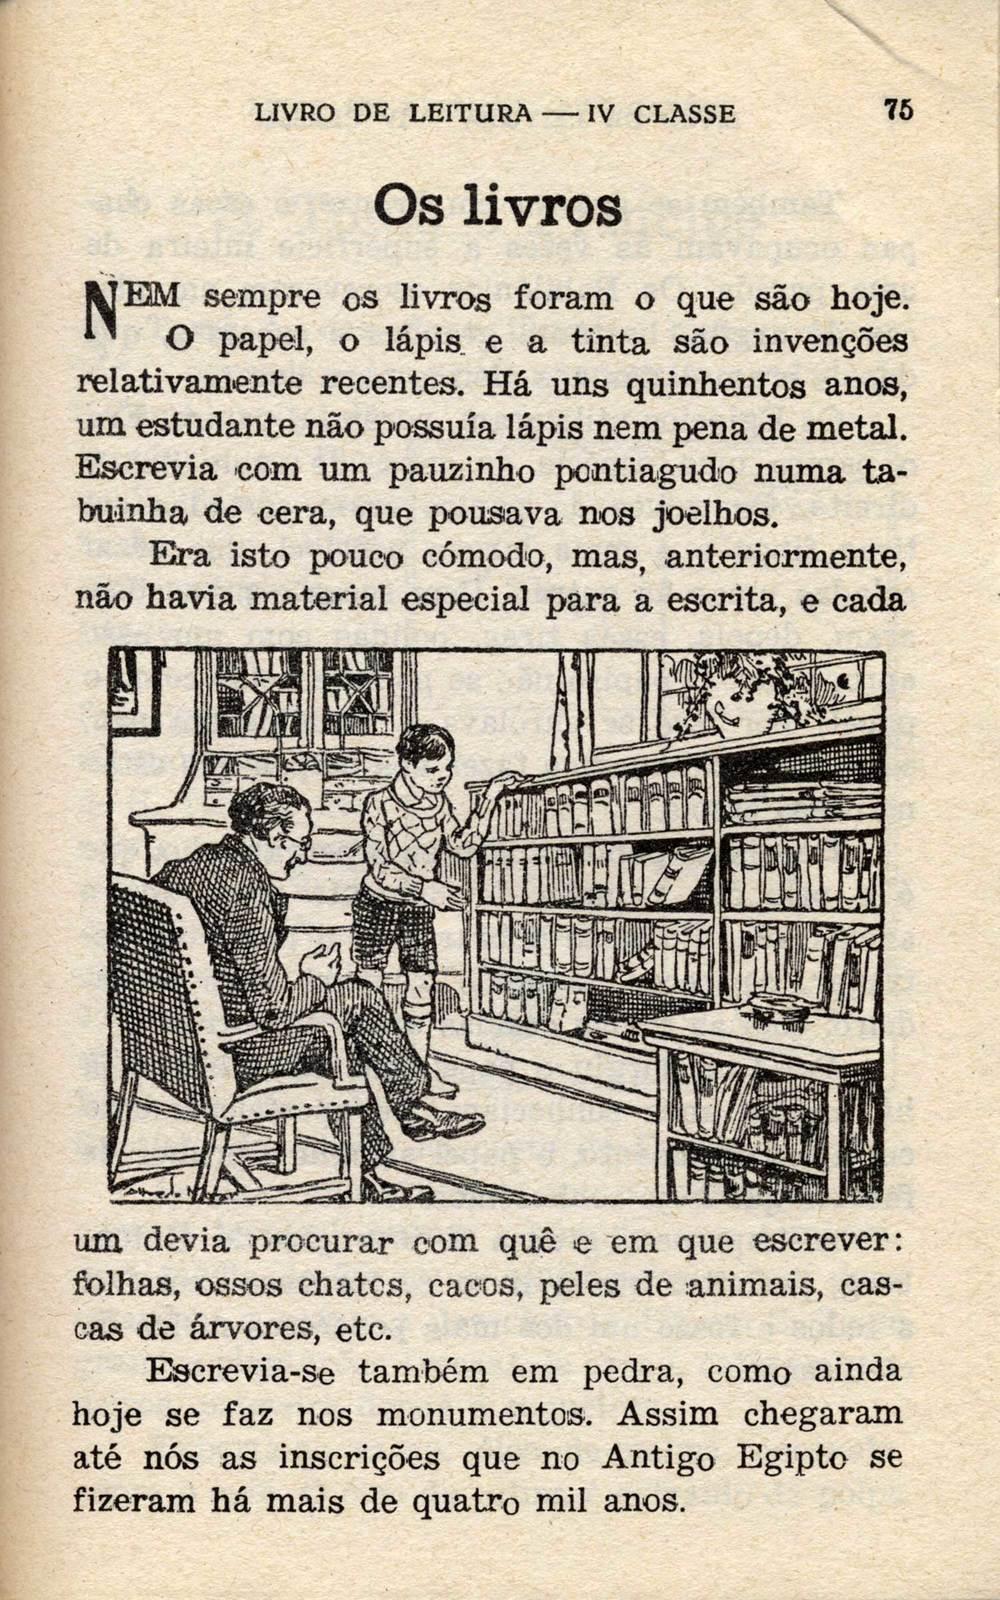 pt_textbk4_075_4thclass_1951.jpg